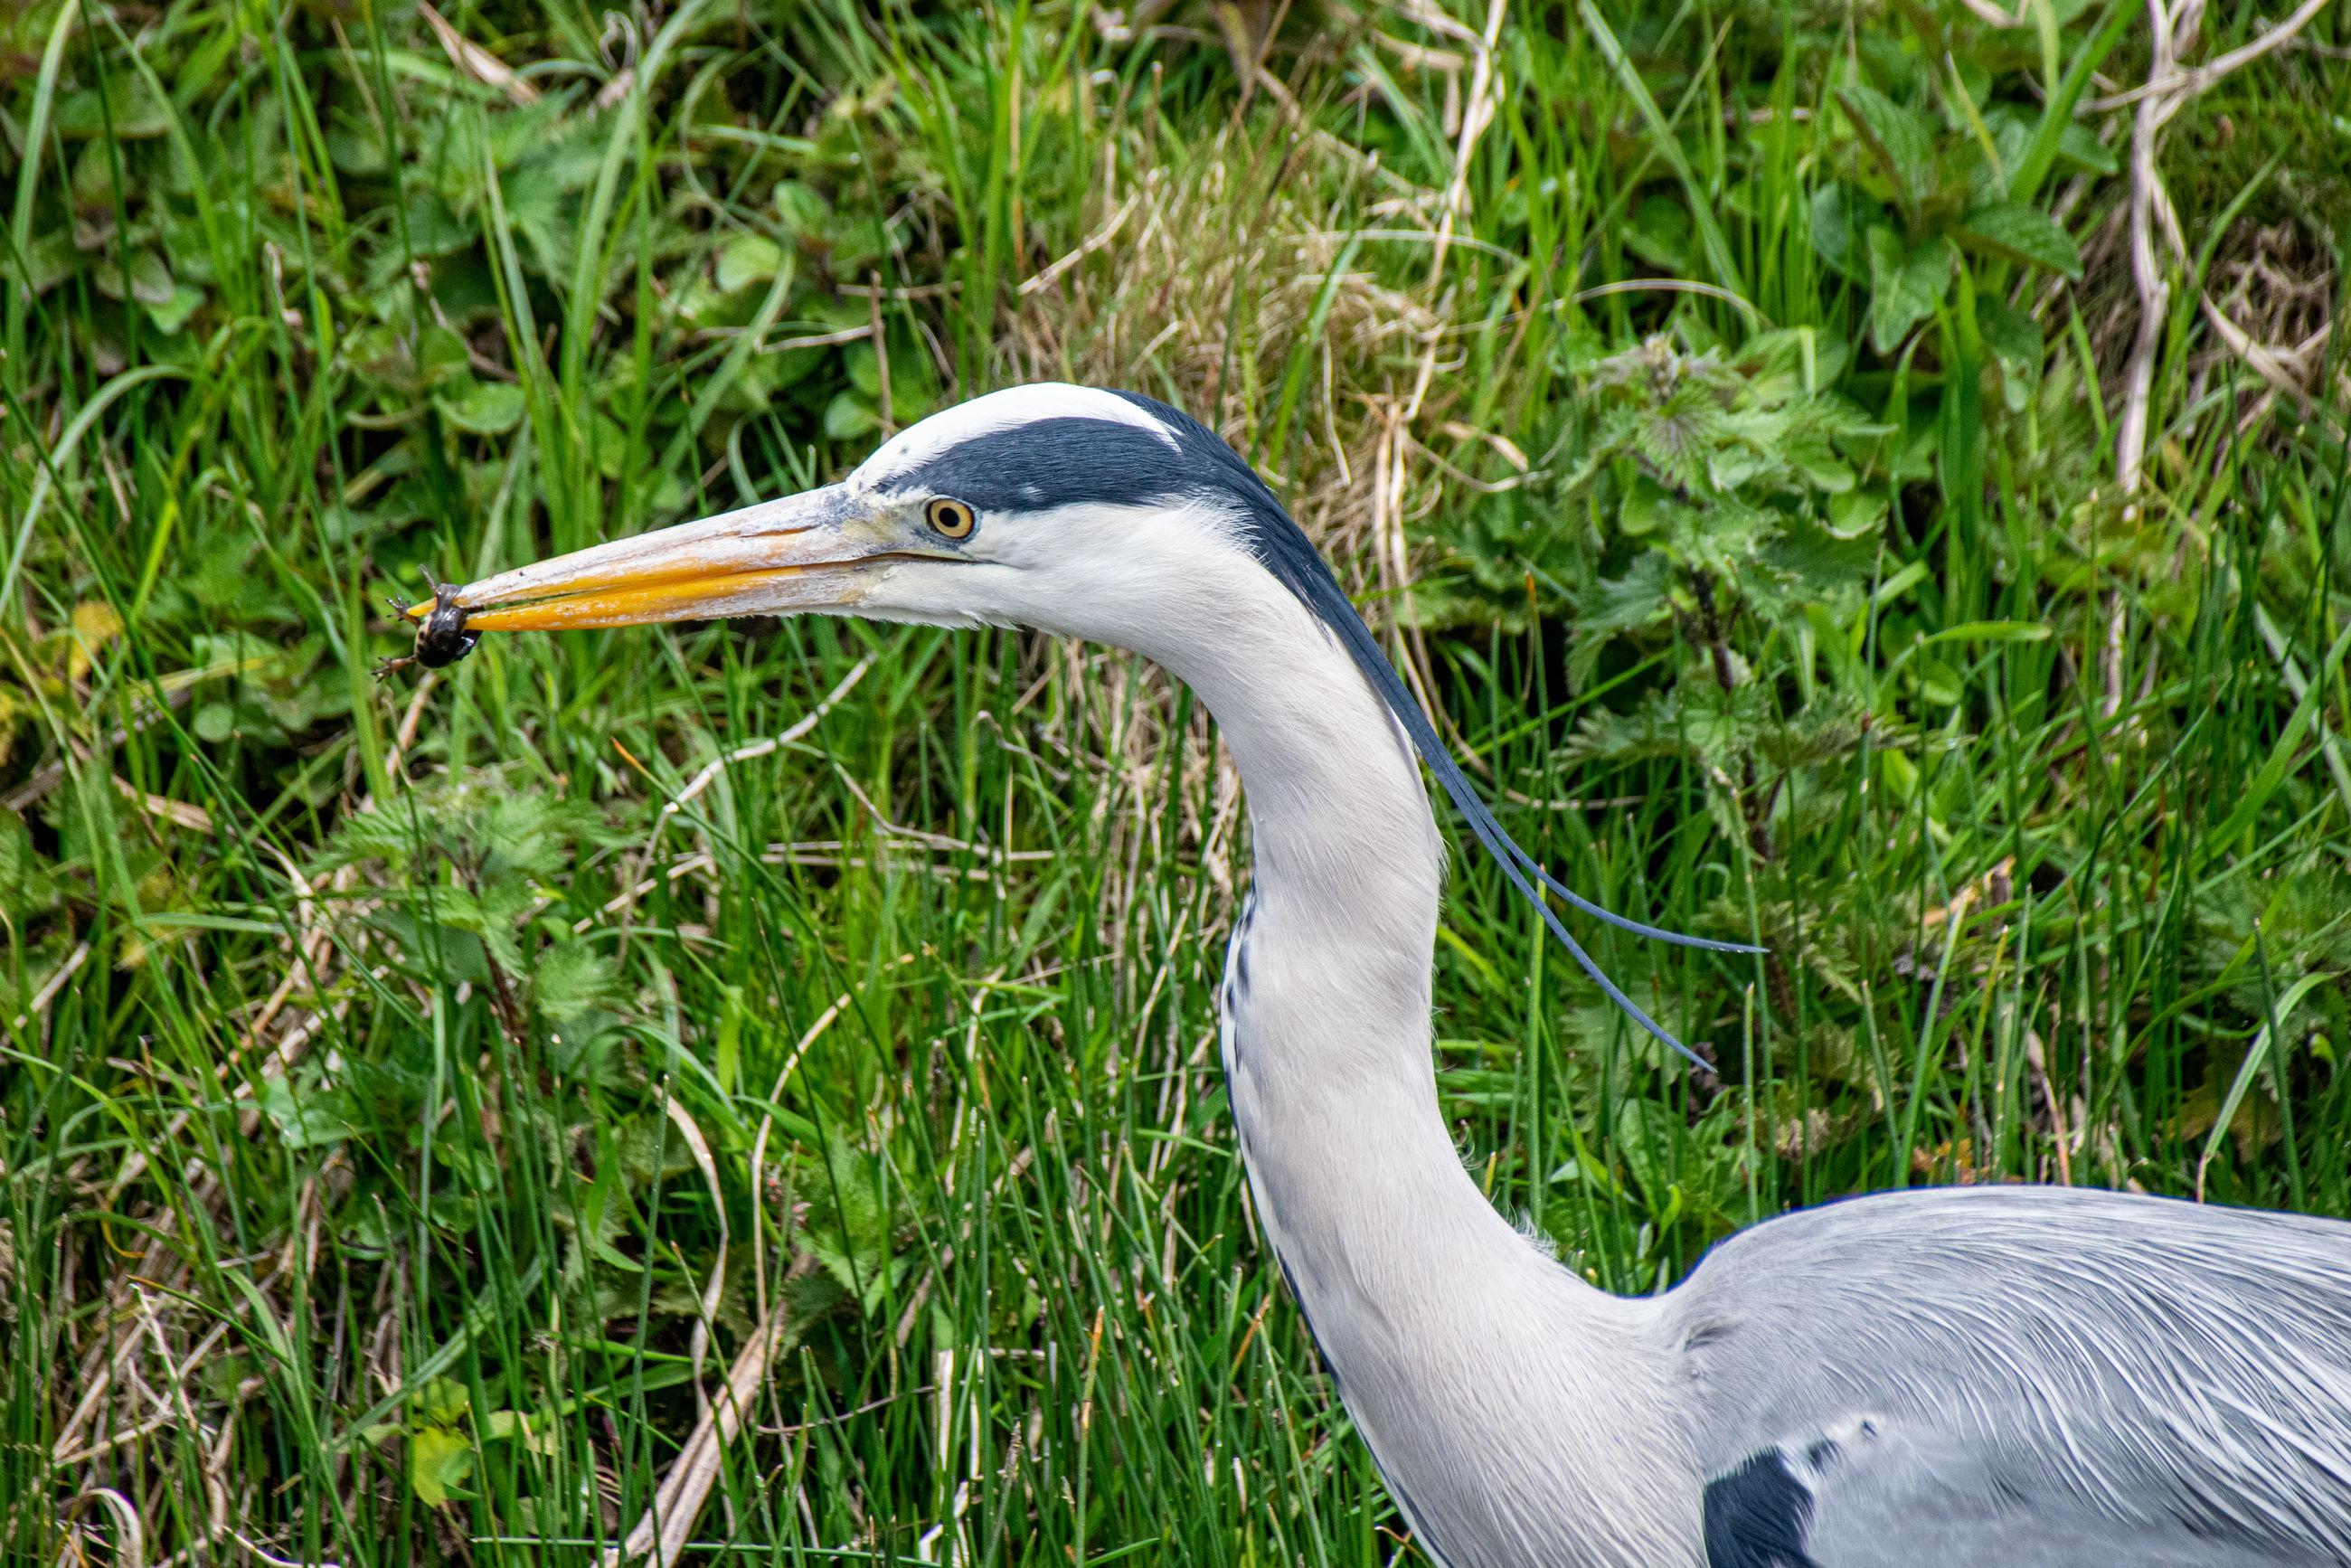 Grey heron, ardea cinerea, hunting a common newt, lissotriton vulgaris, in shallow river water